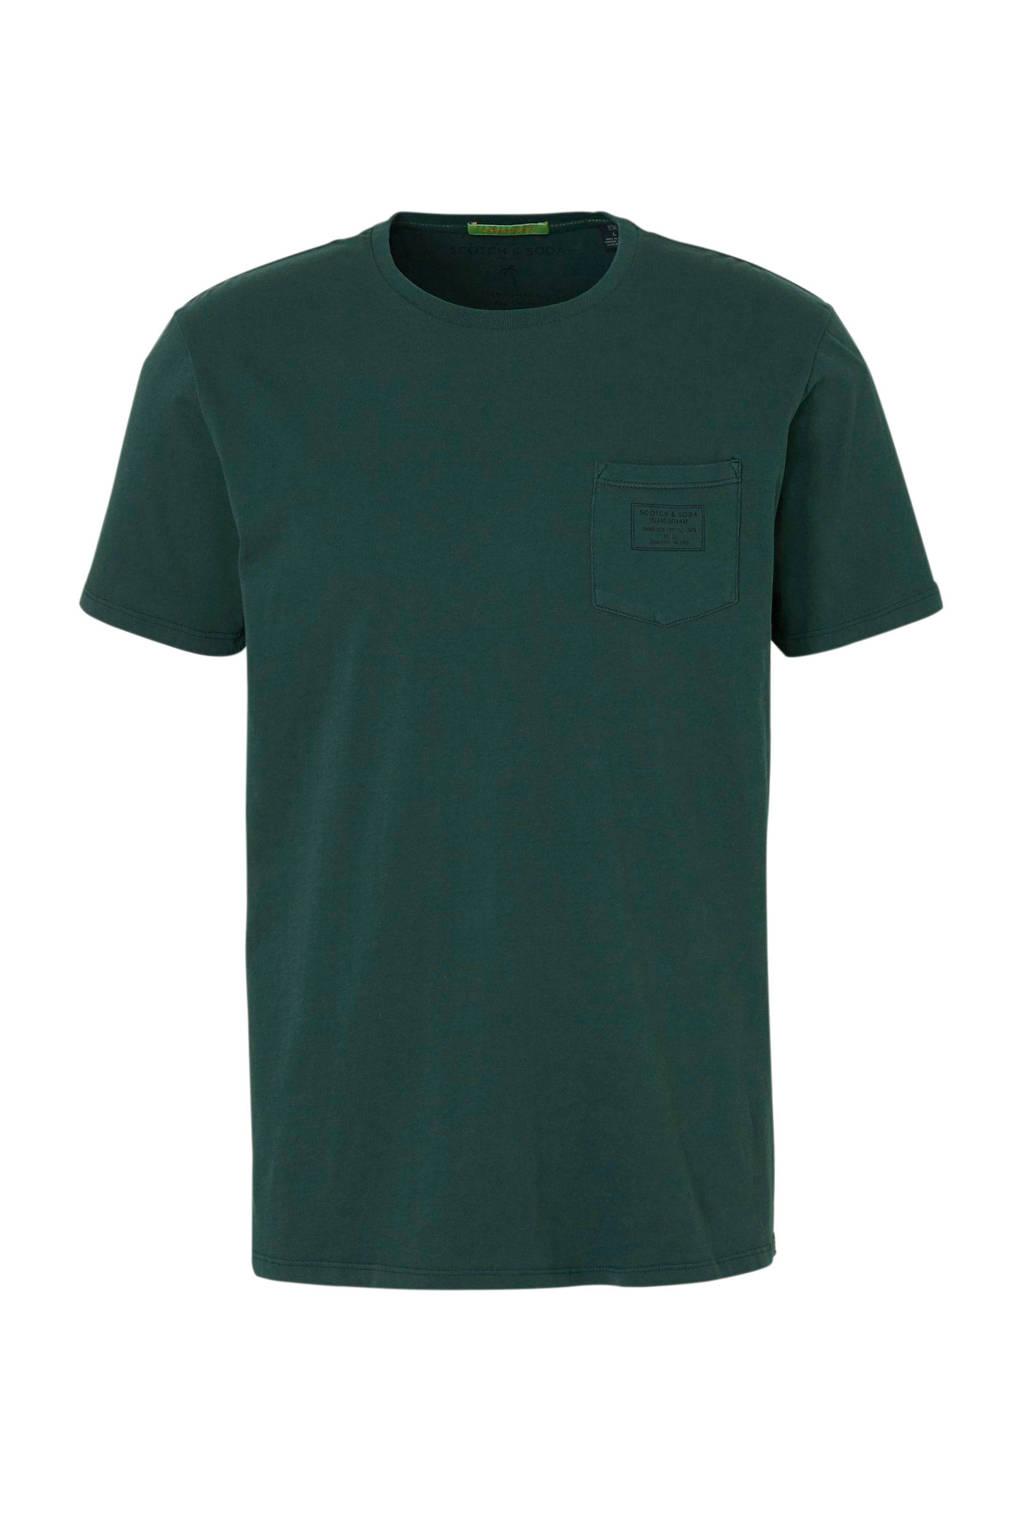 Scotch & Soda T-shirt, Groen